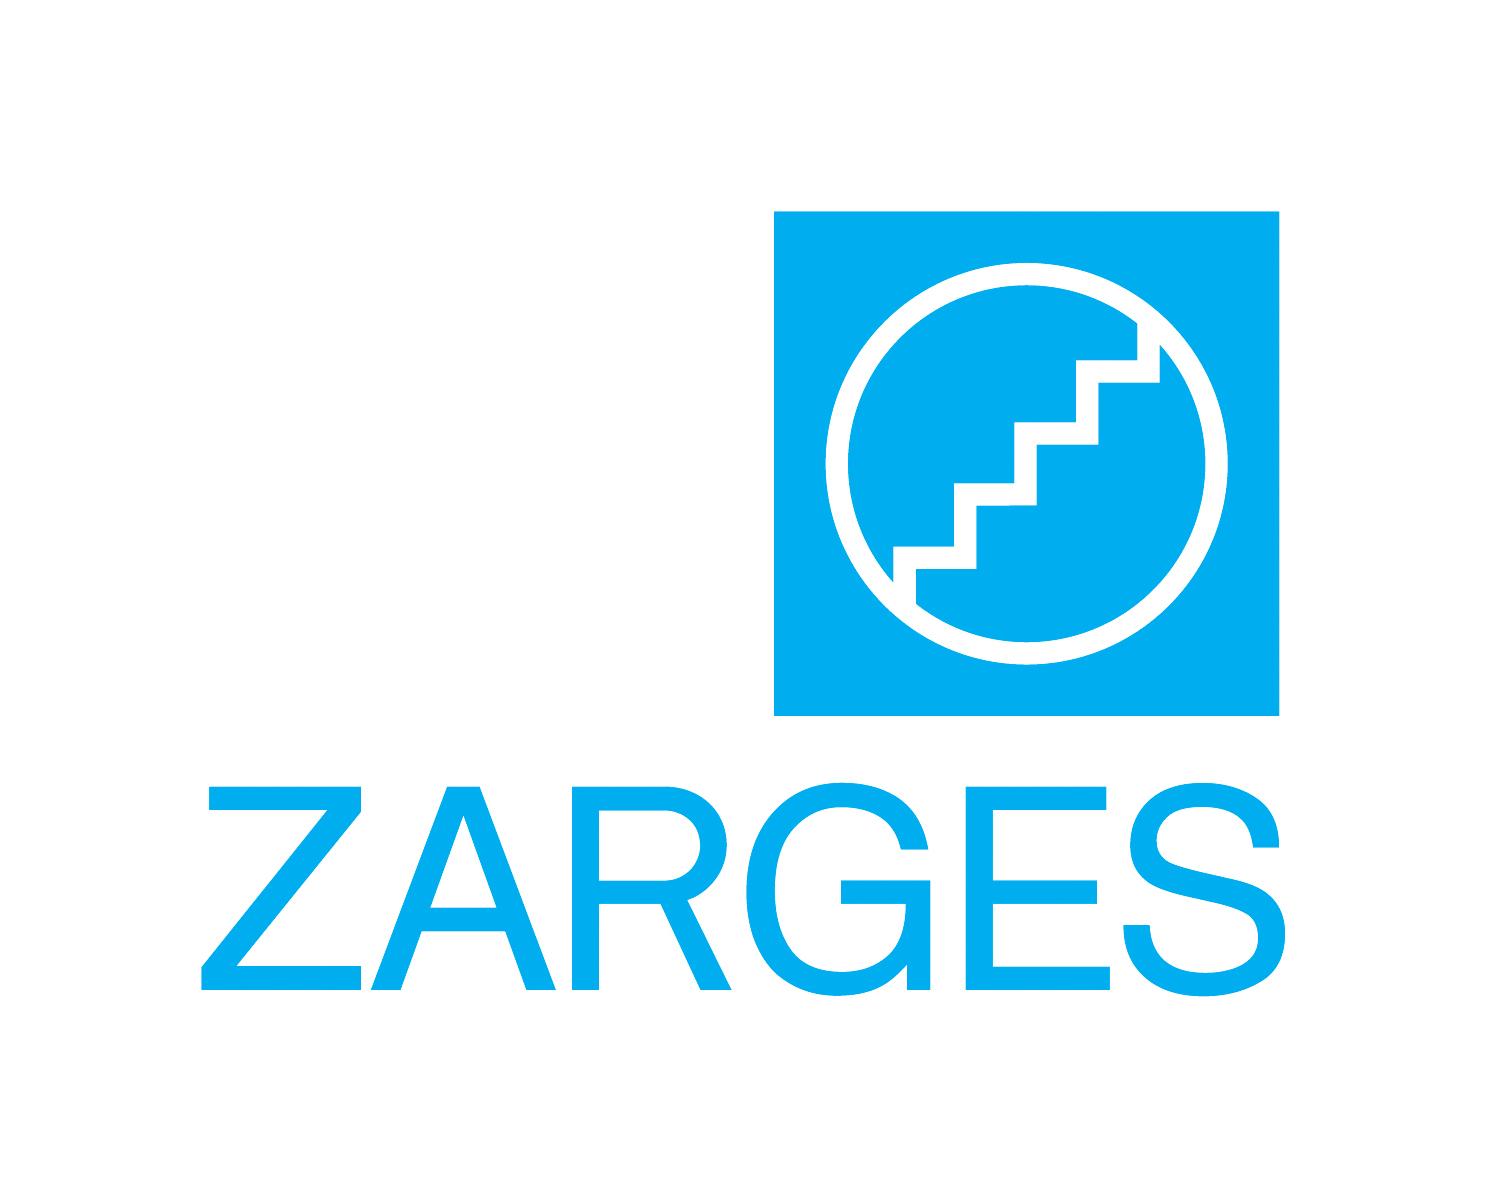 Zarges - Logo - Azubicard